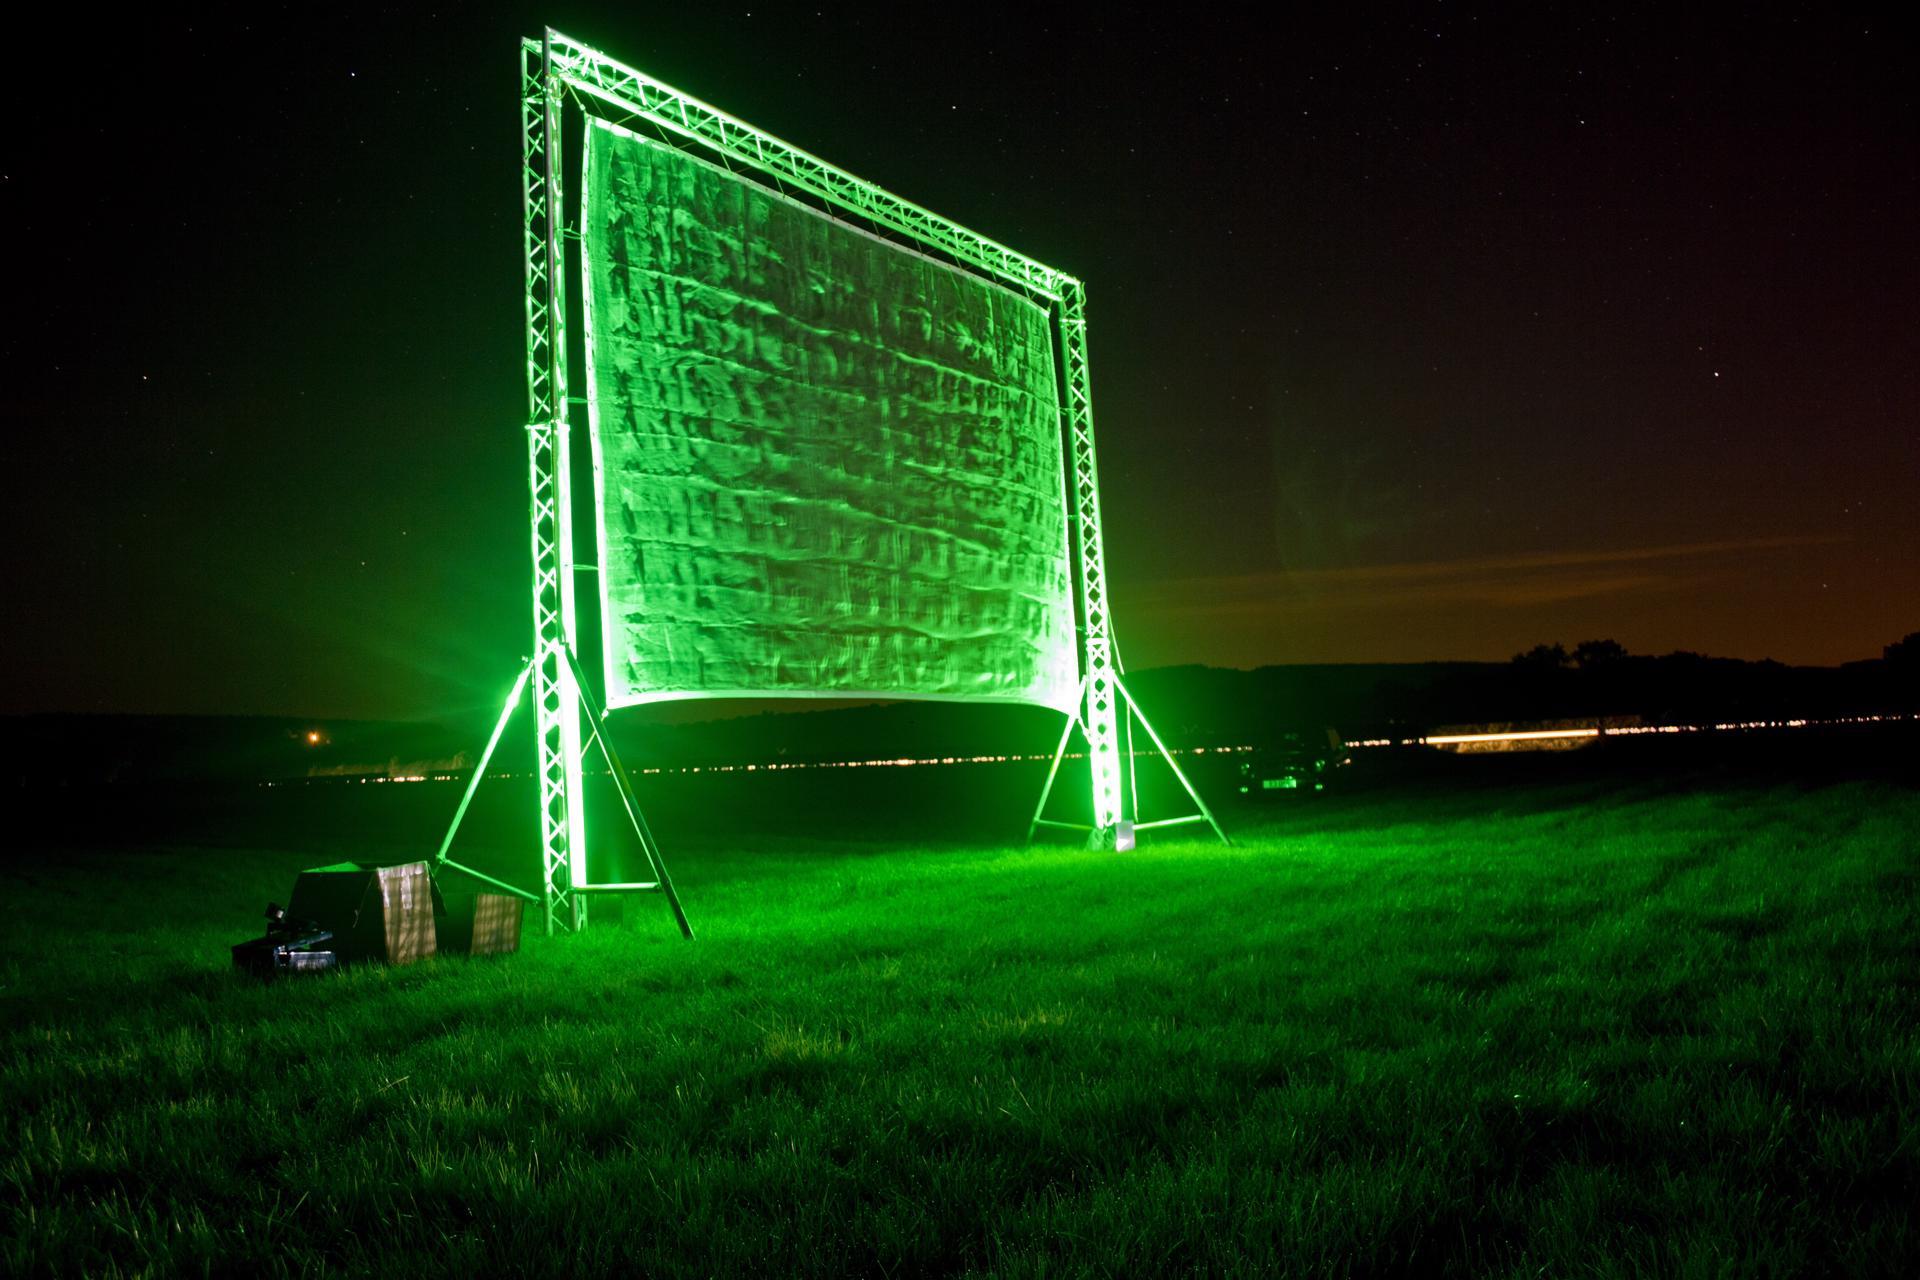 5m-high-laser-screen_21375762013_o-1920x1280.jpg